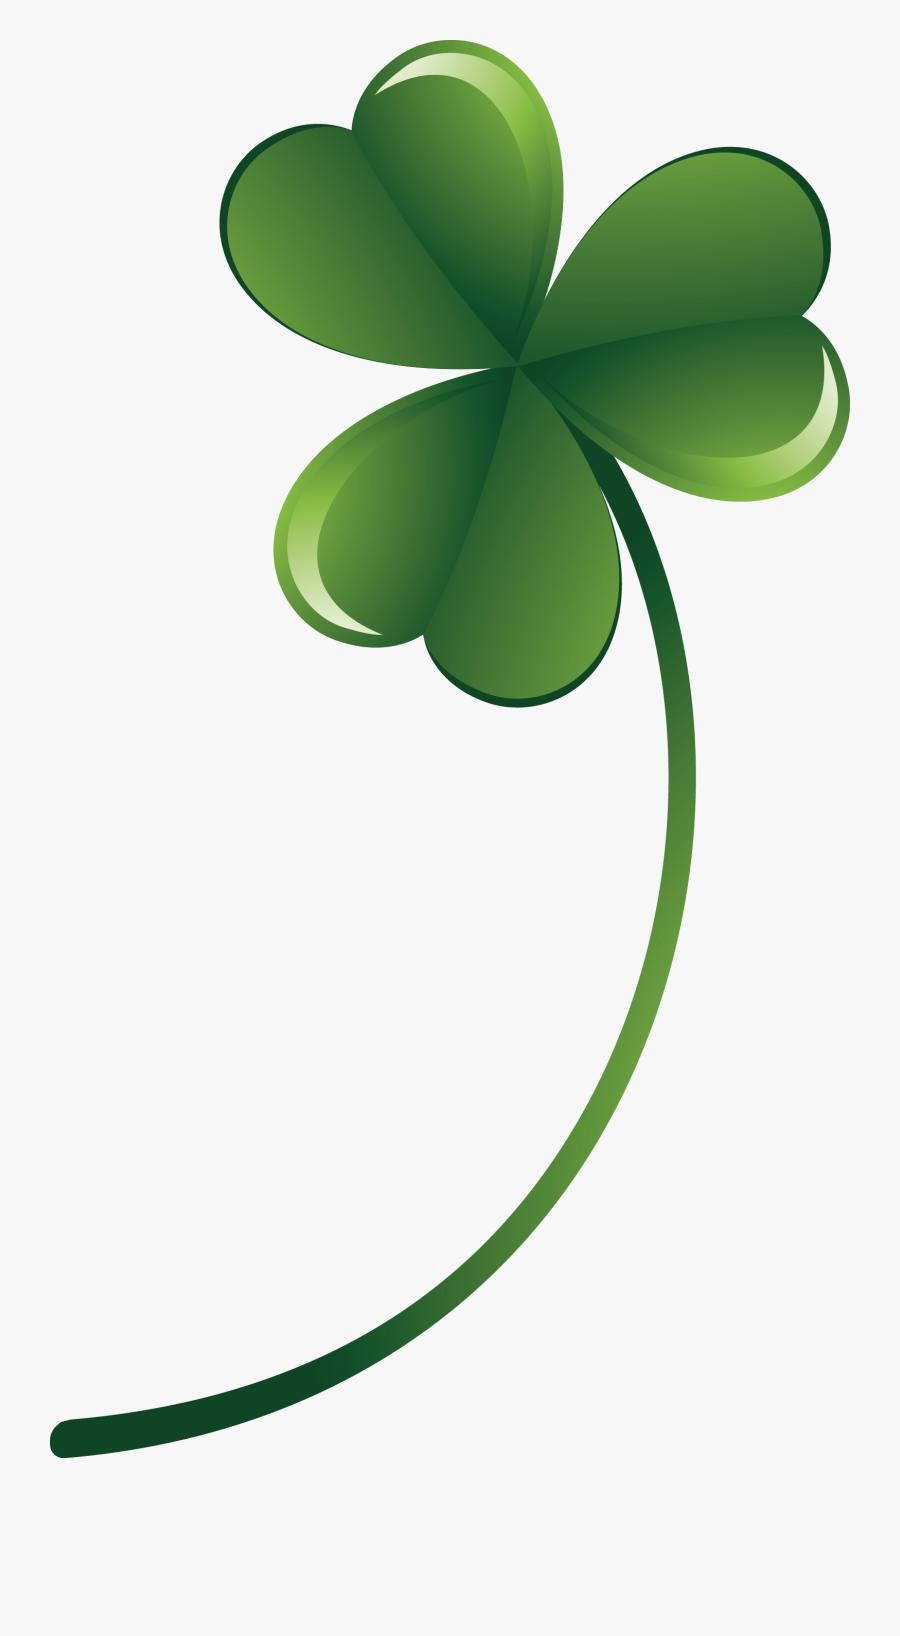 Four-leaf Clover Euclidean Vector - Transparent Background Four Leaf Clover Vector Free, Transparent Clipart